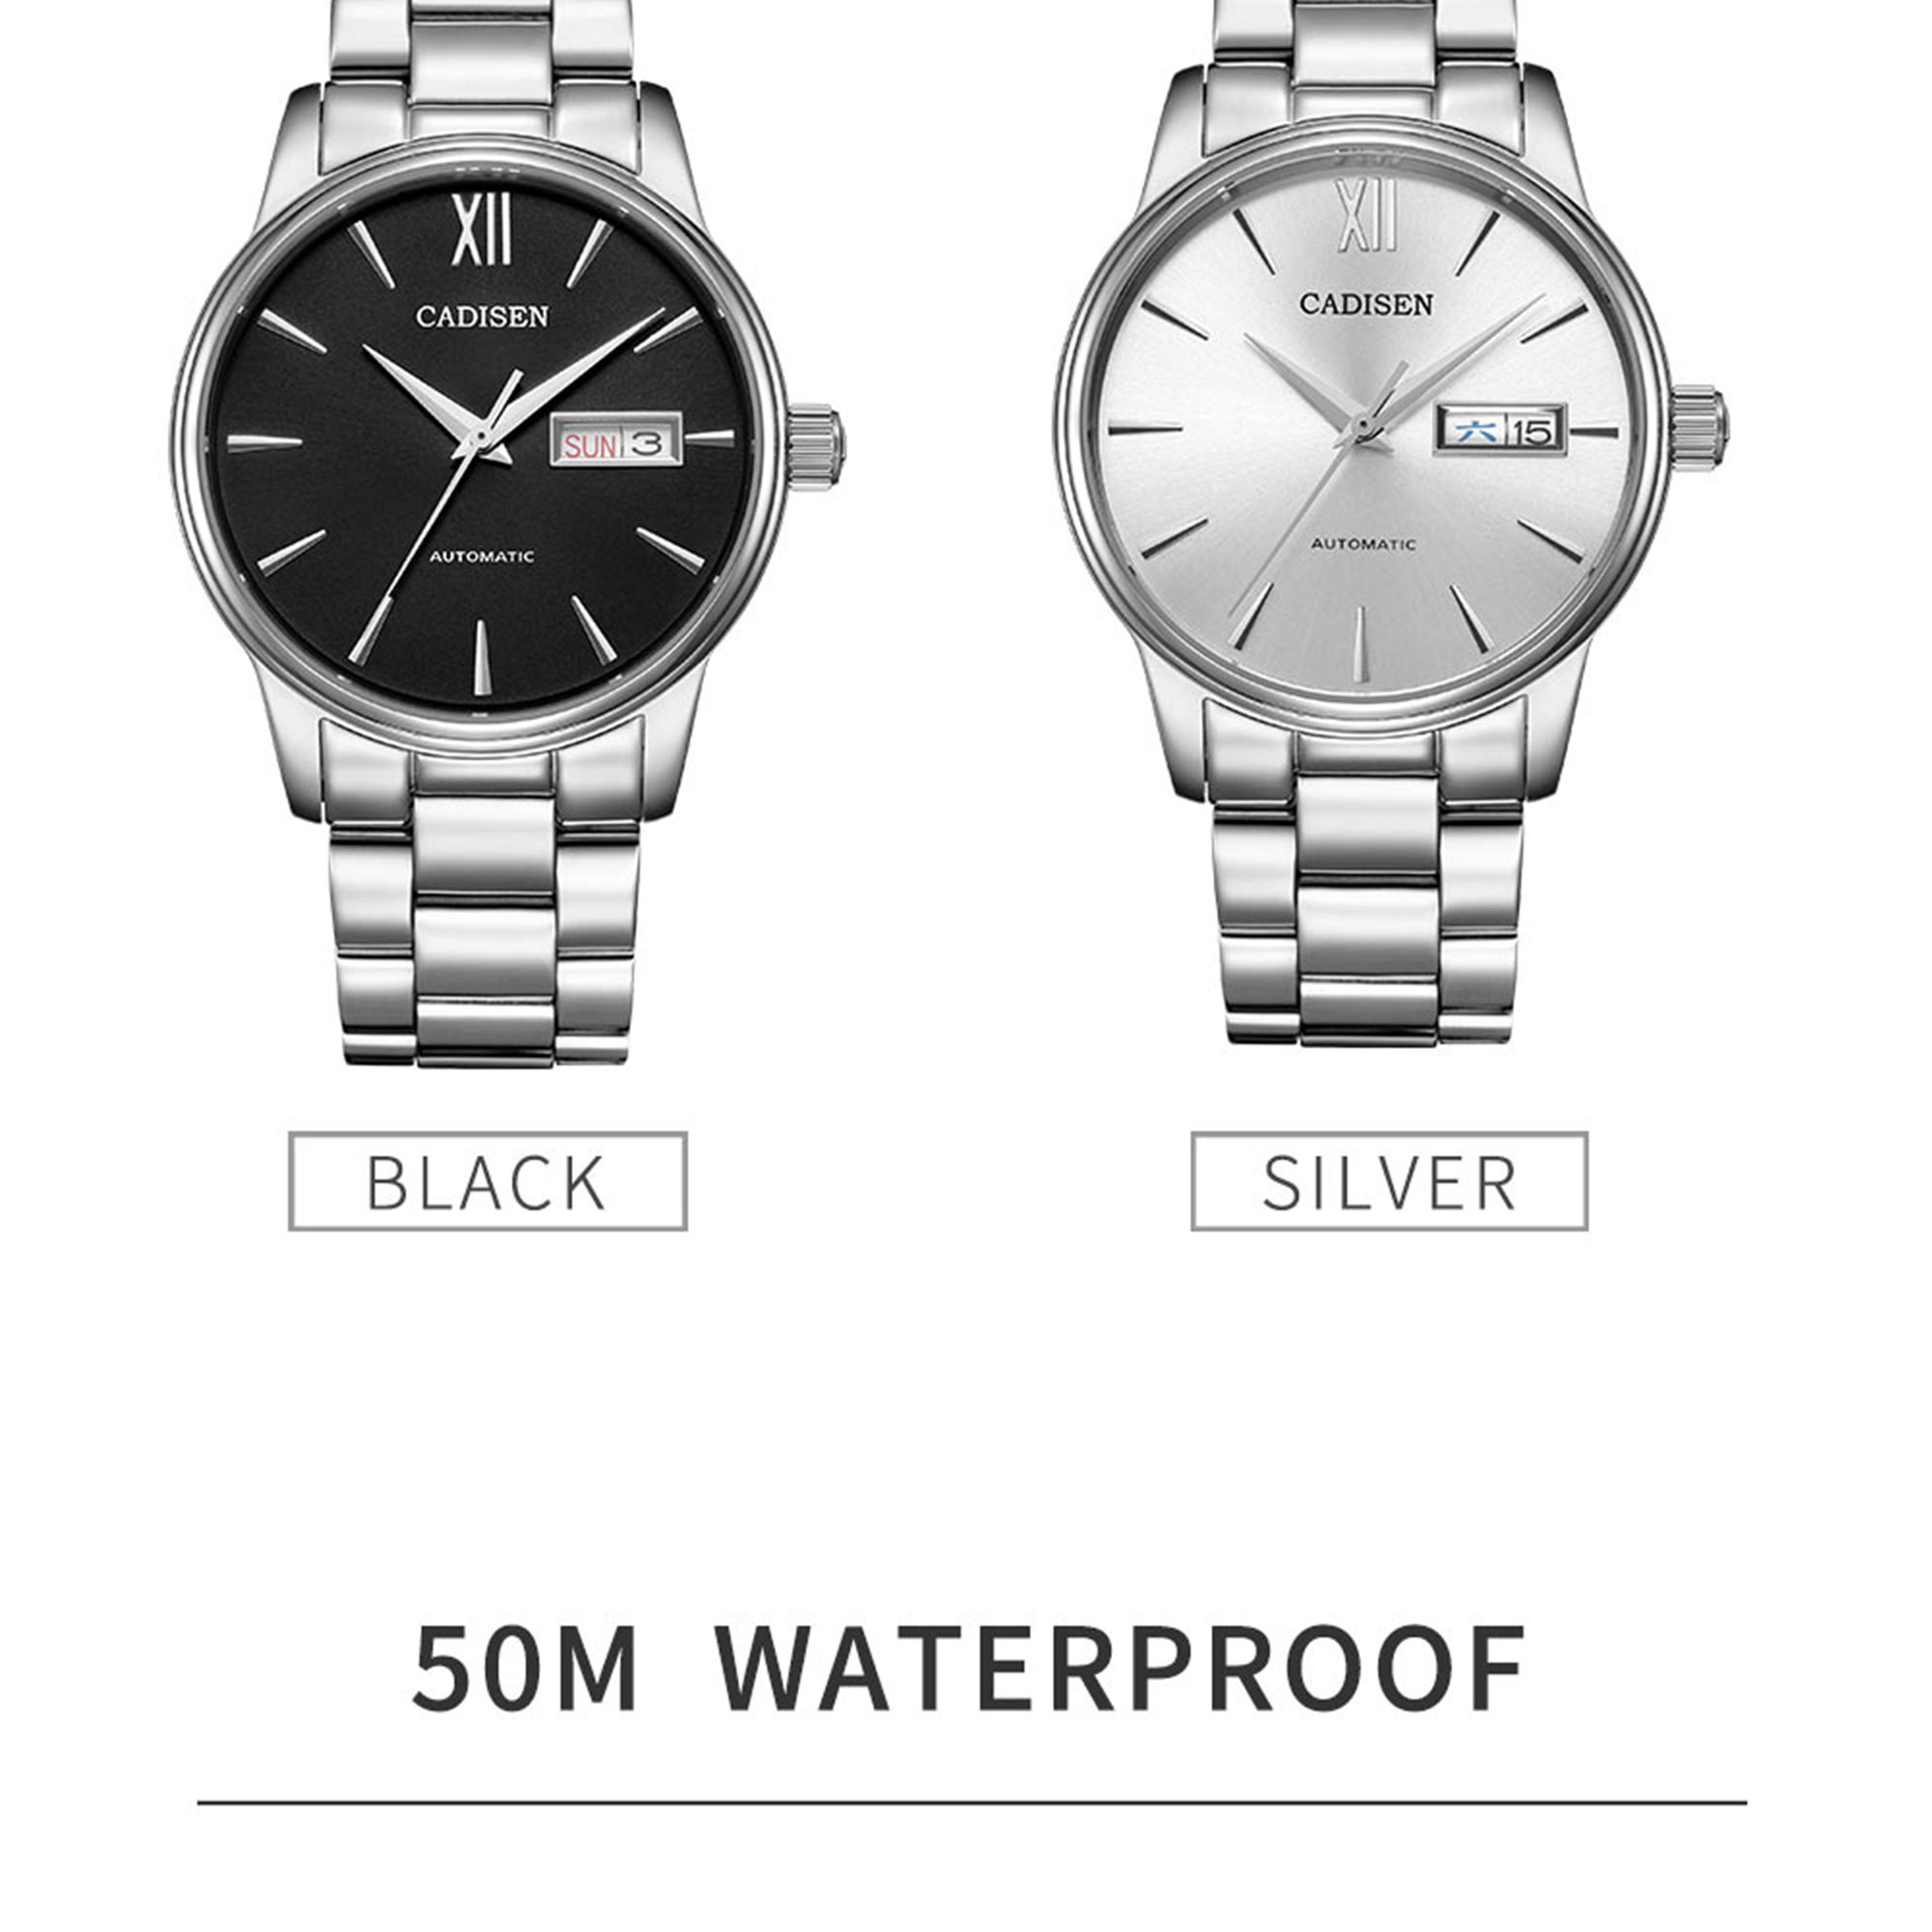 Hf4ee66666a7145d6bb2b8a2c6401f9cf4 CADISEN Men Watch Automatic Mechanical Watches Role Date Week Top Luxury Brand Japan NH36A Wrist watch Clock Relogio Masculino